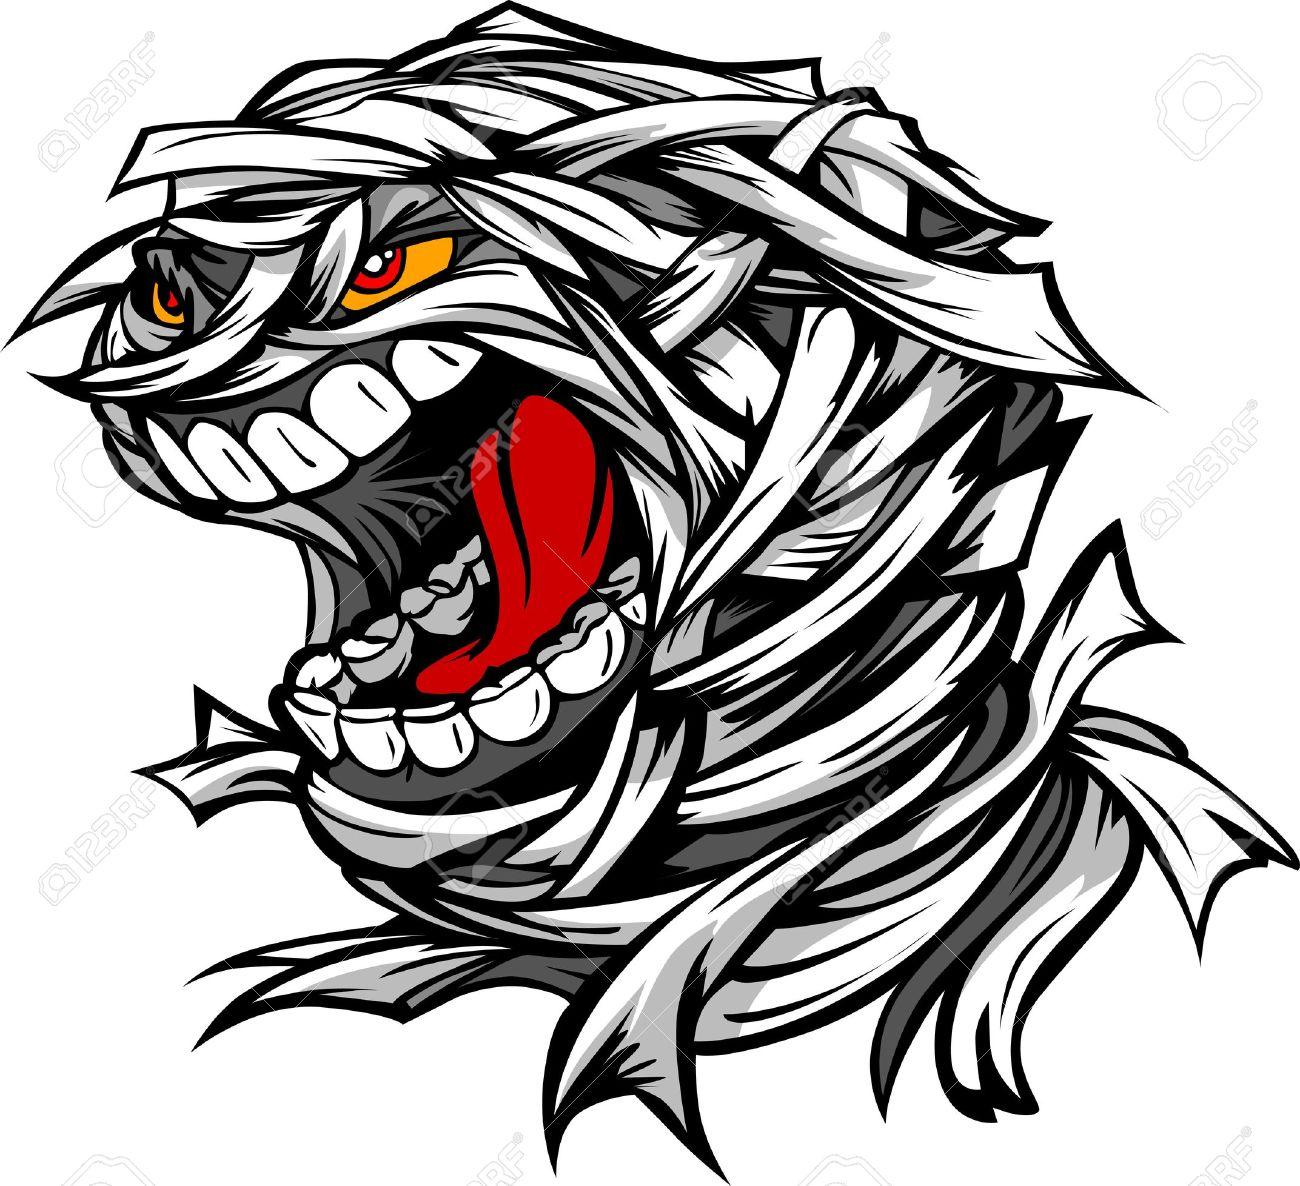 Cartoon Image of a Scary Screaming Halloween Monster Mummy Head Stock Vector - 15142964